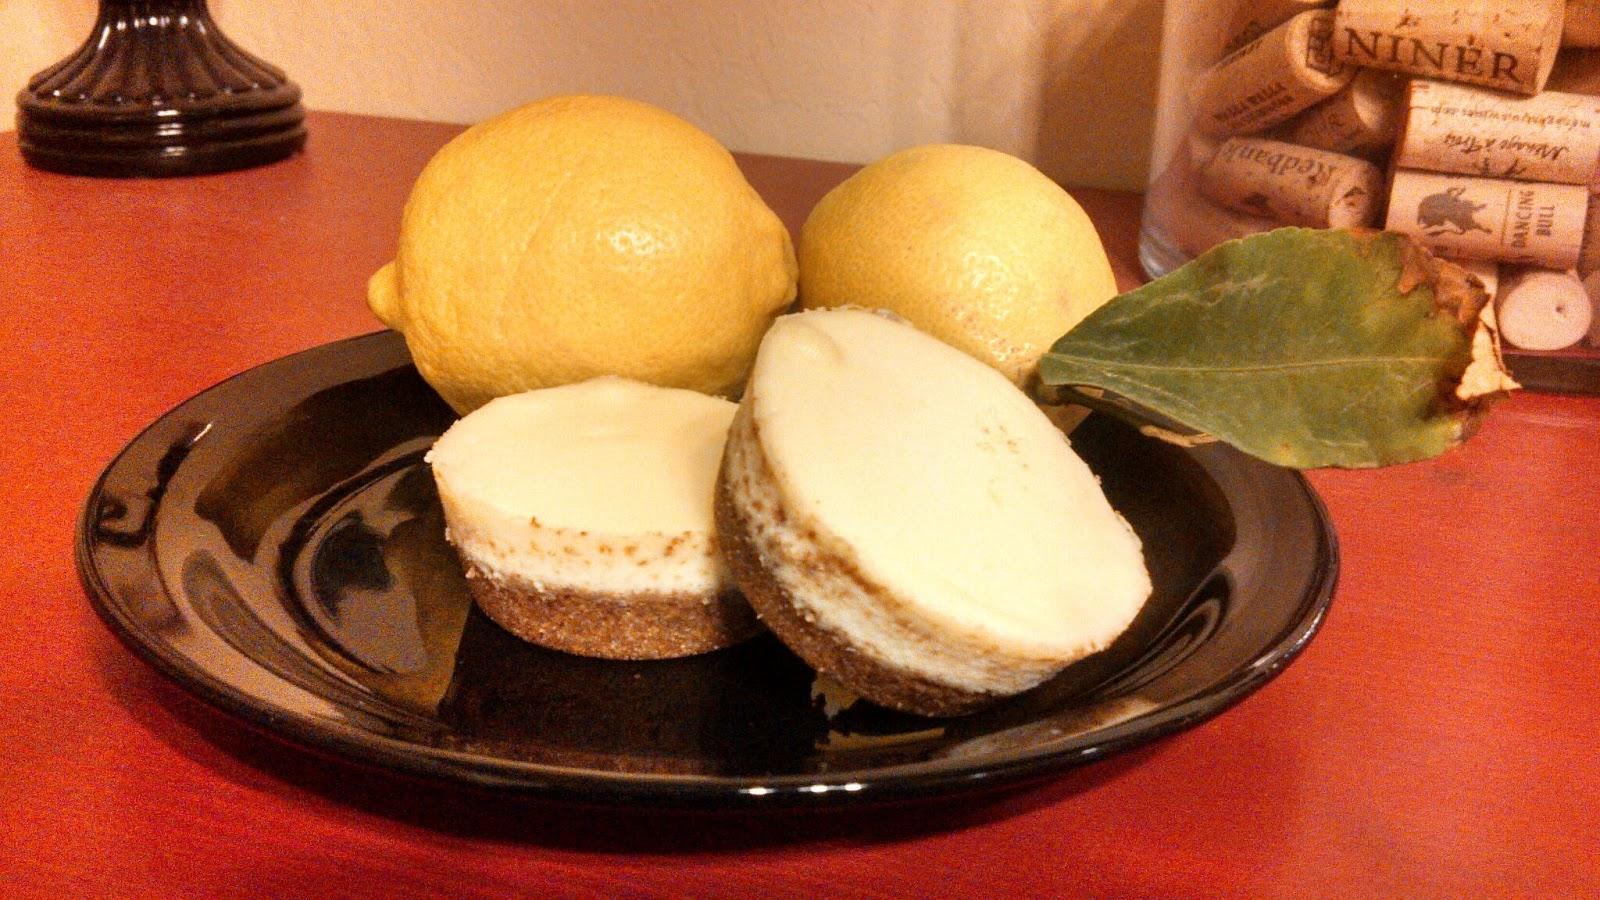 Hot Dog It's a Food Blog: Lemon Goat Cheese Cheesecake